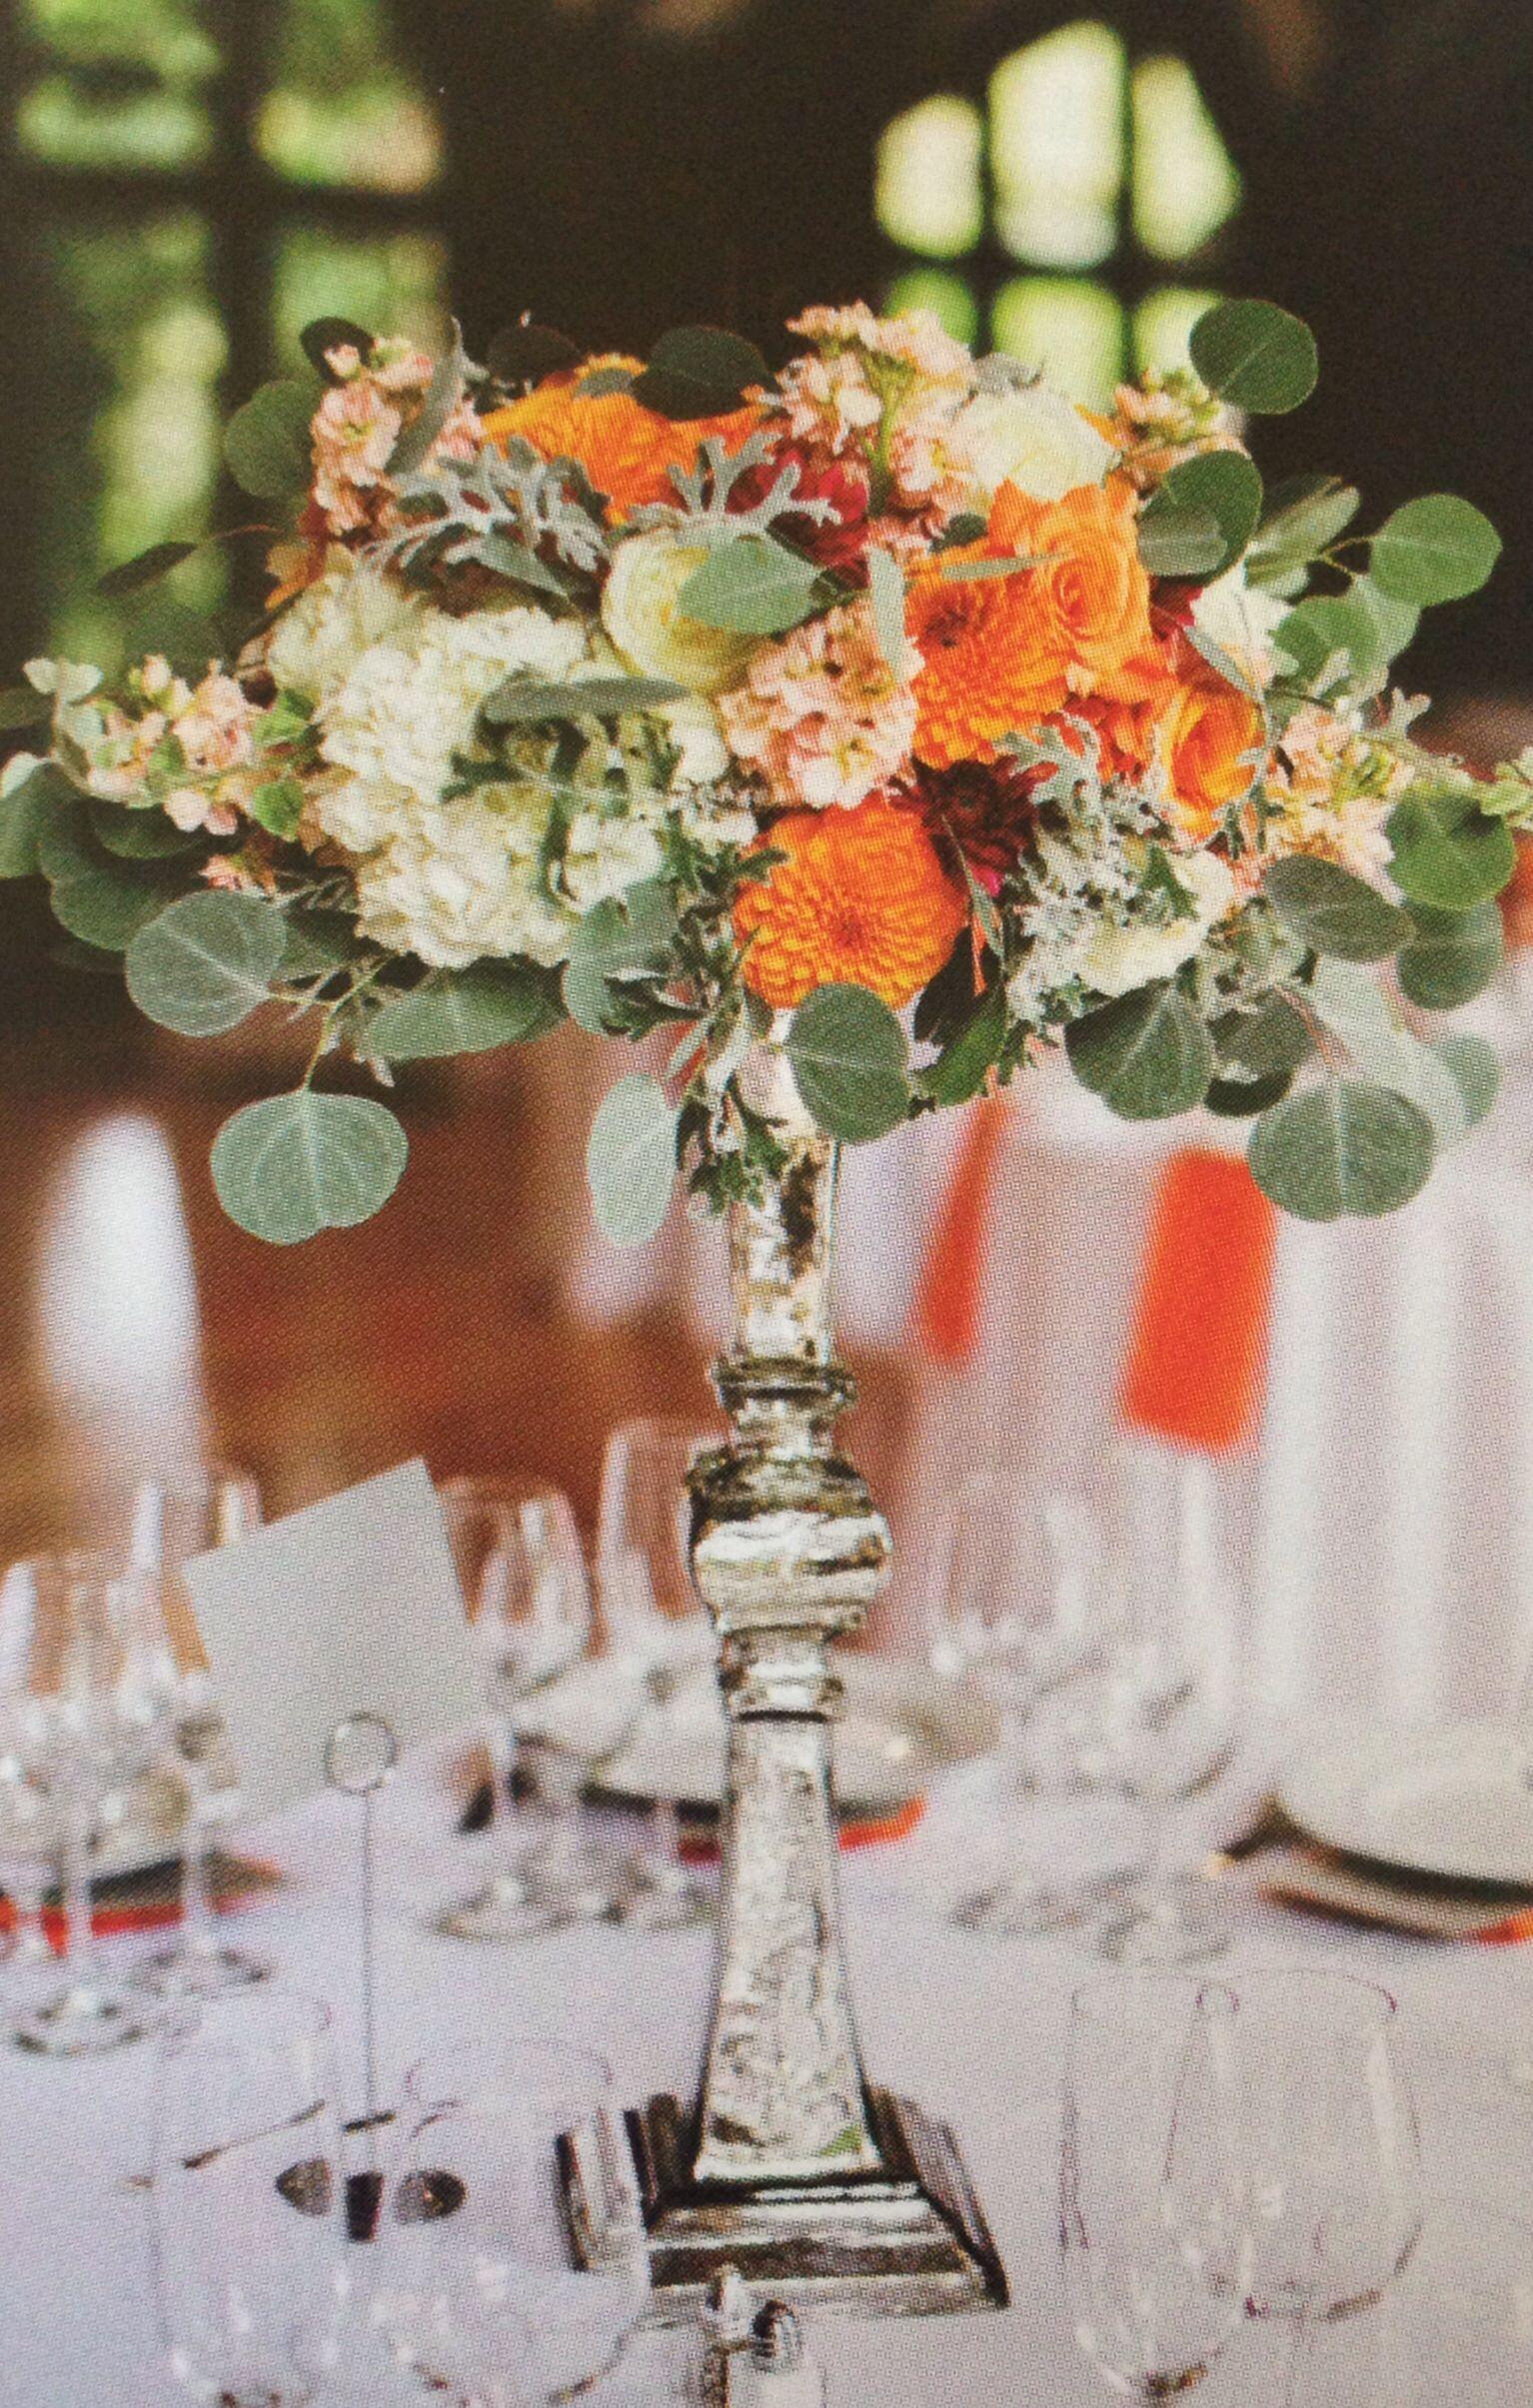 Love the orange centerpiece unique diy wedding centerpieces